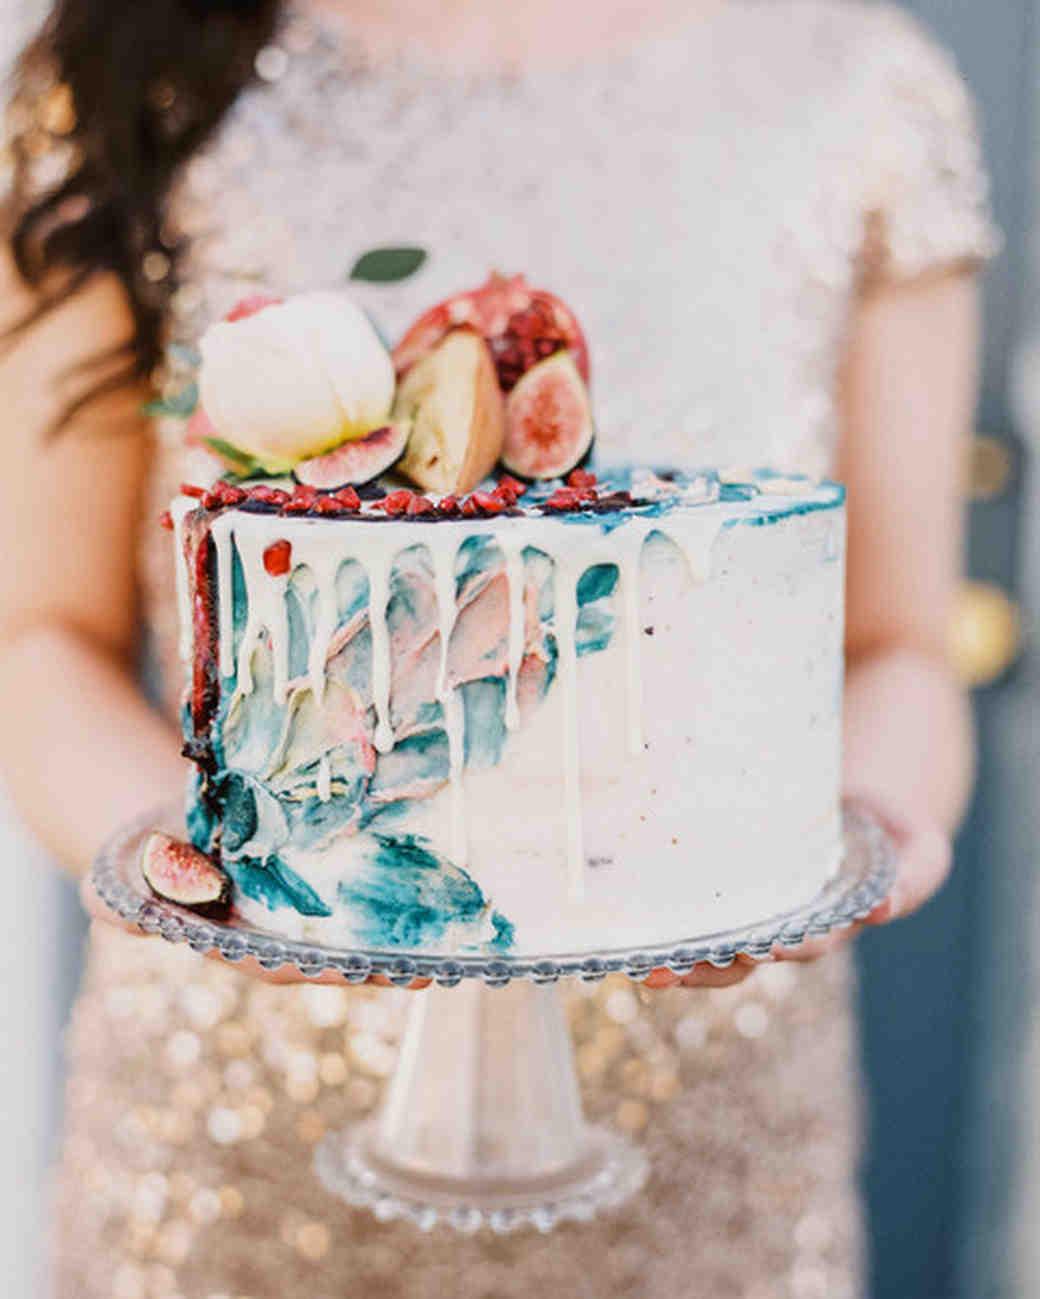 Painted Wedding Cake with Fruit